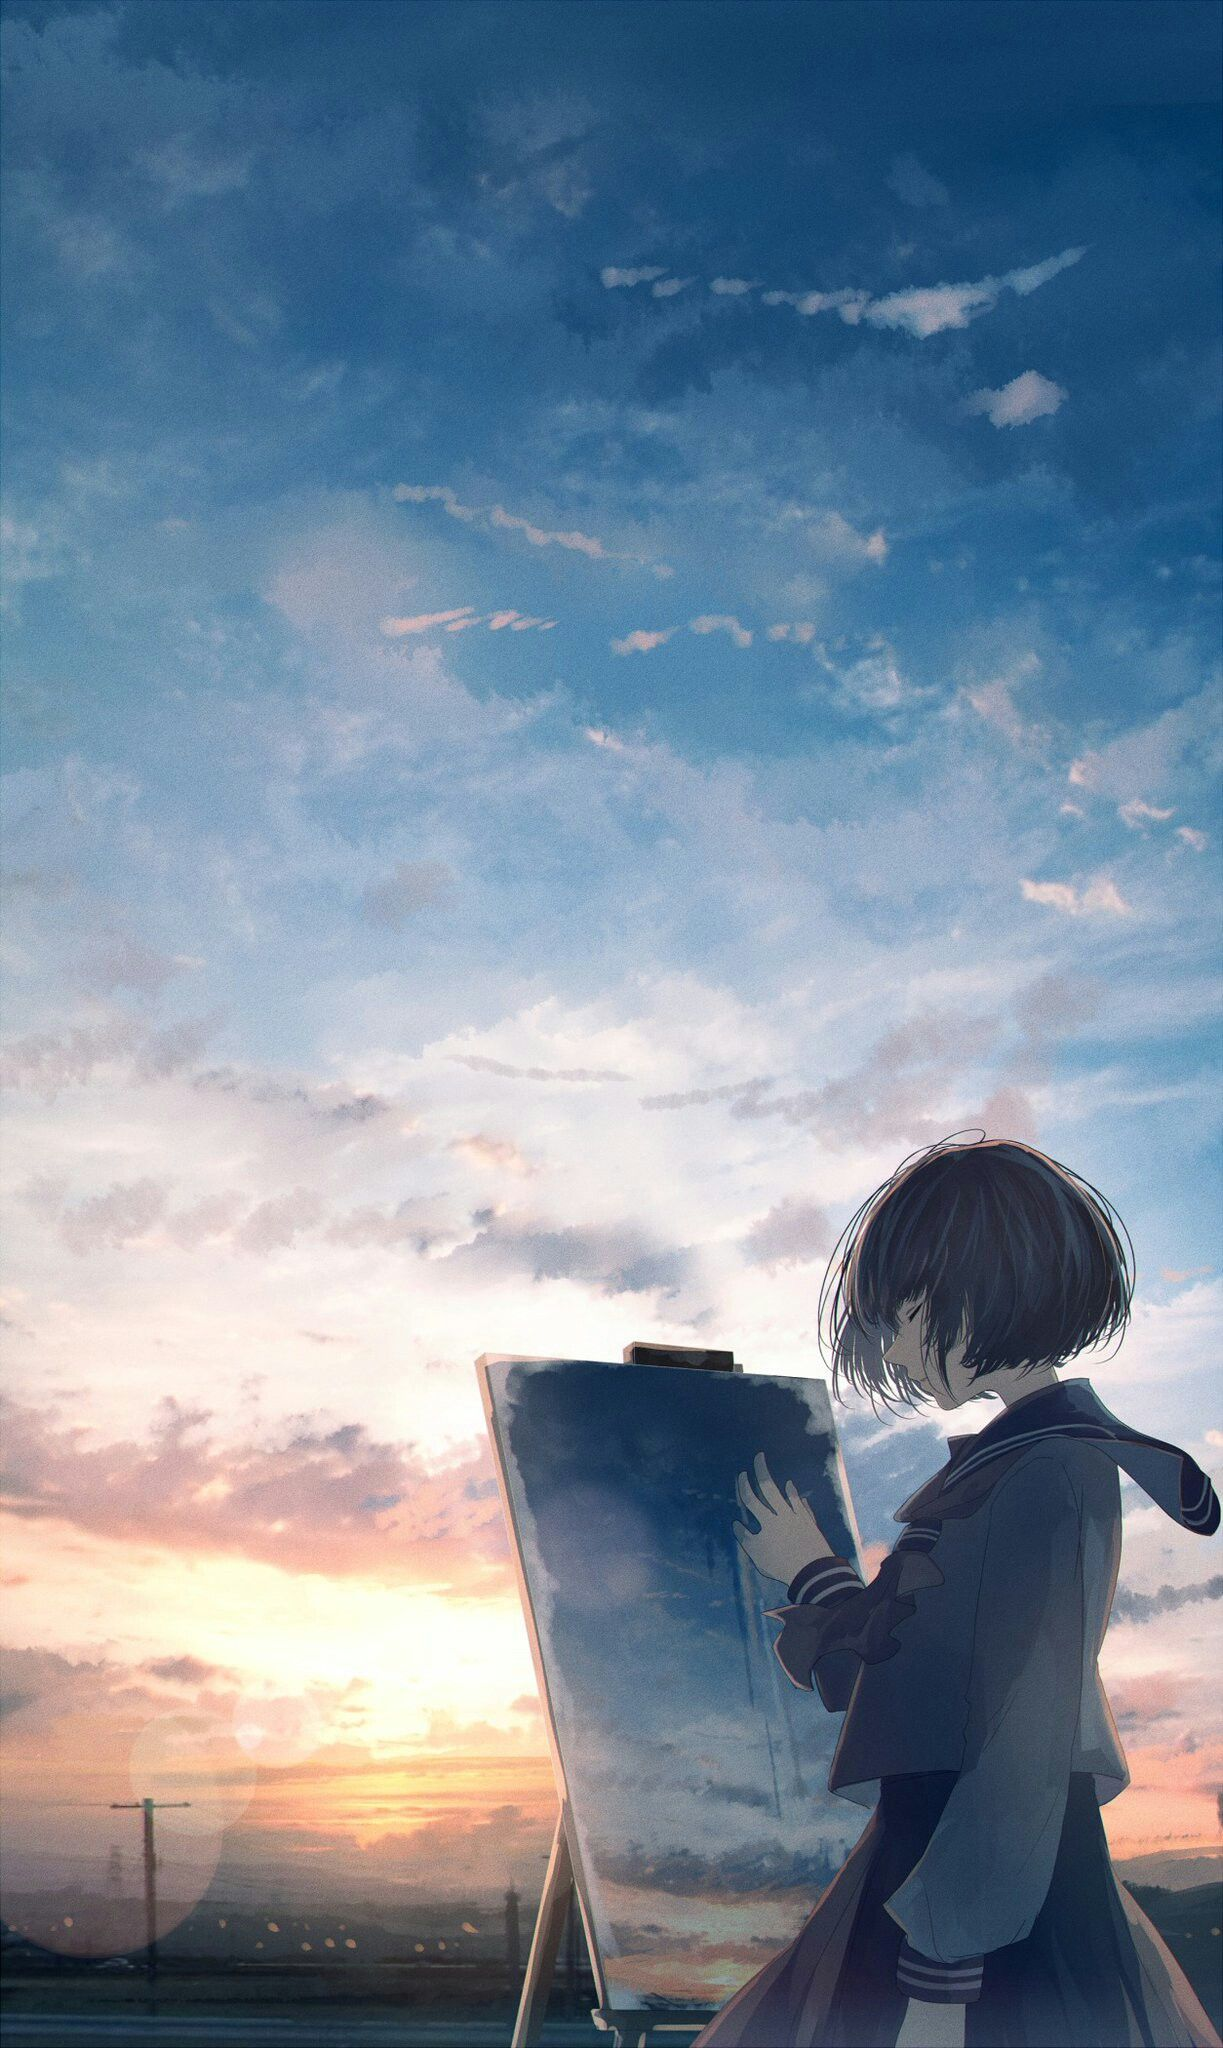 Gambar Pemandangan anime oleh Ngaphuong pada Bắc Kinh